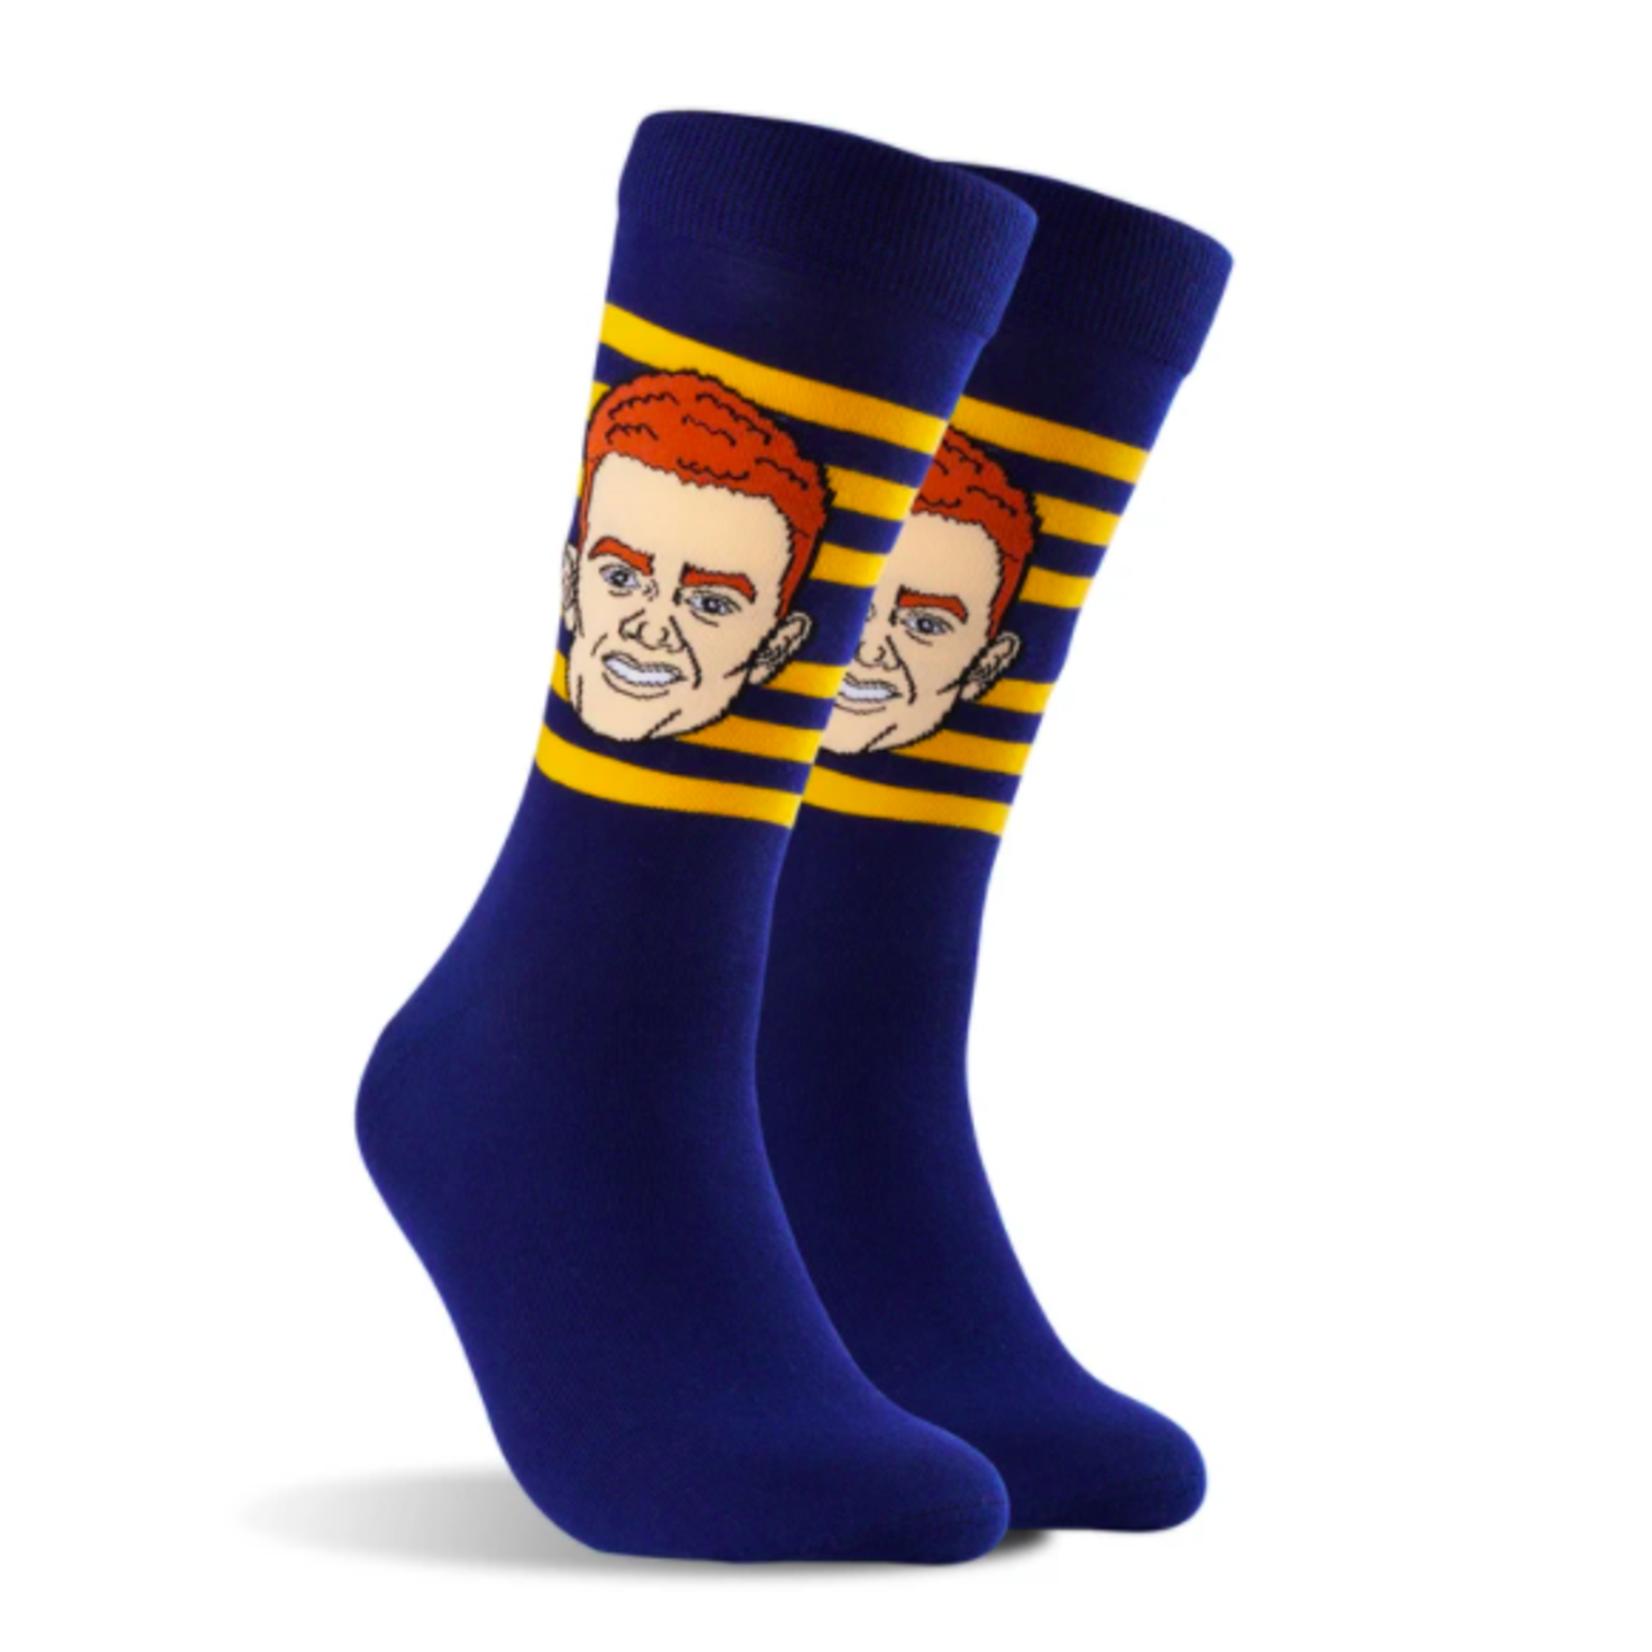 Major League Socks - Jack Eichel